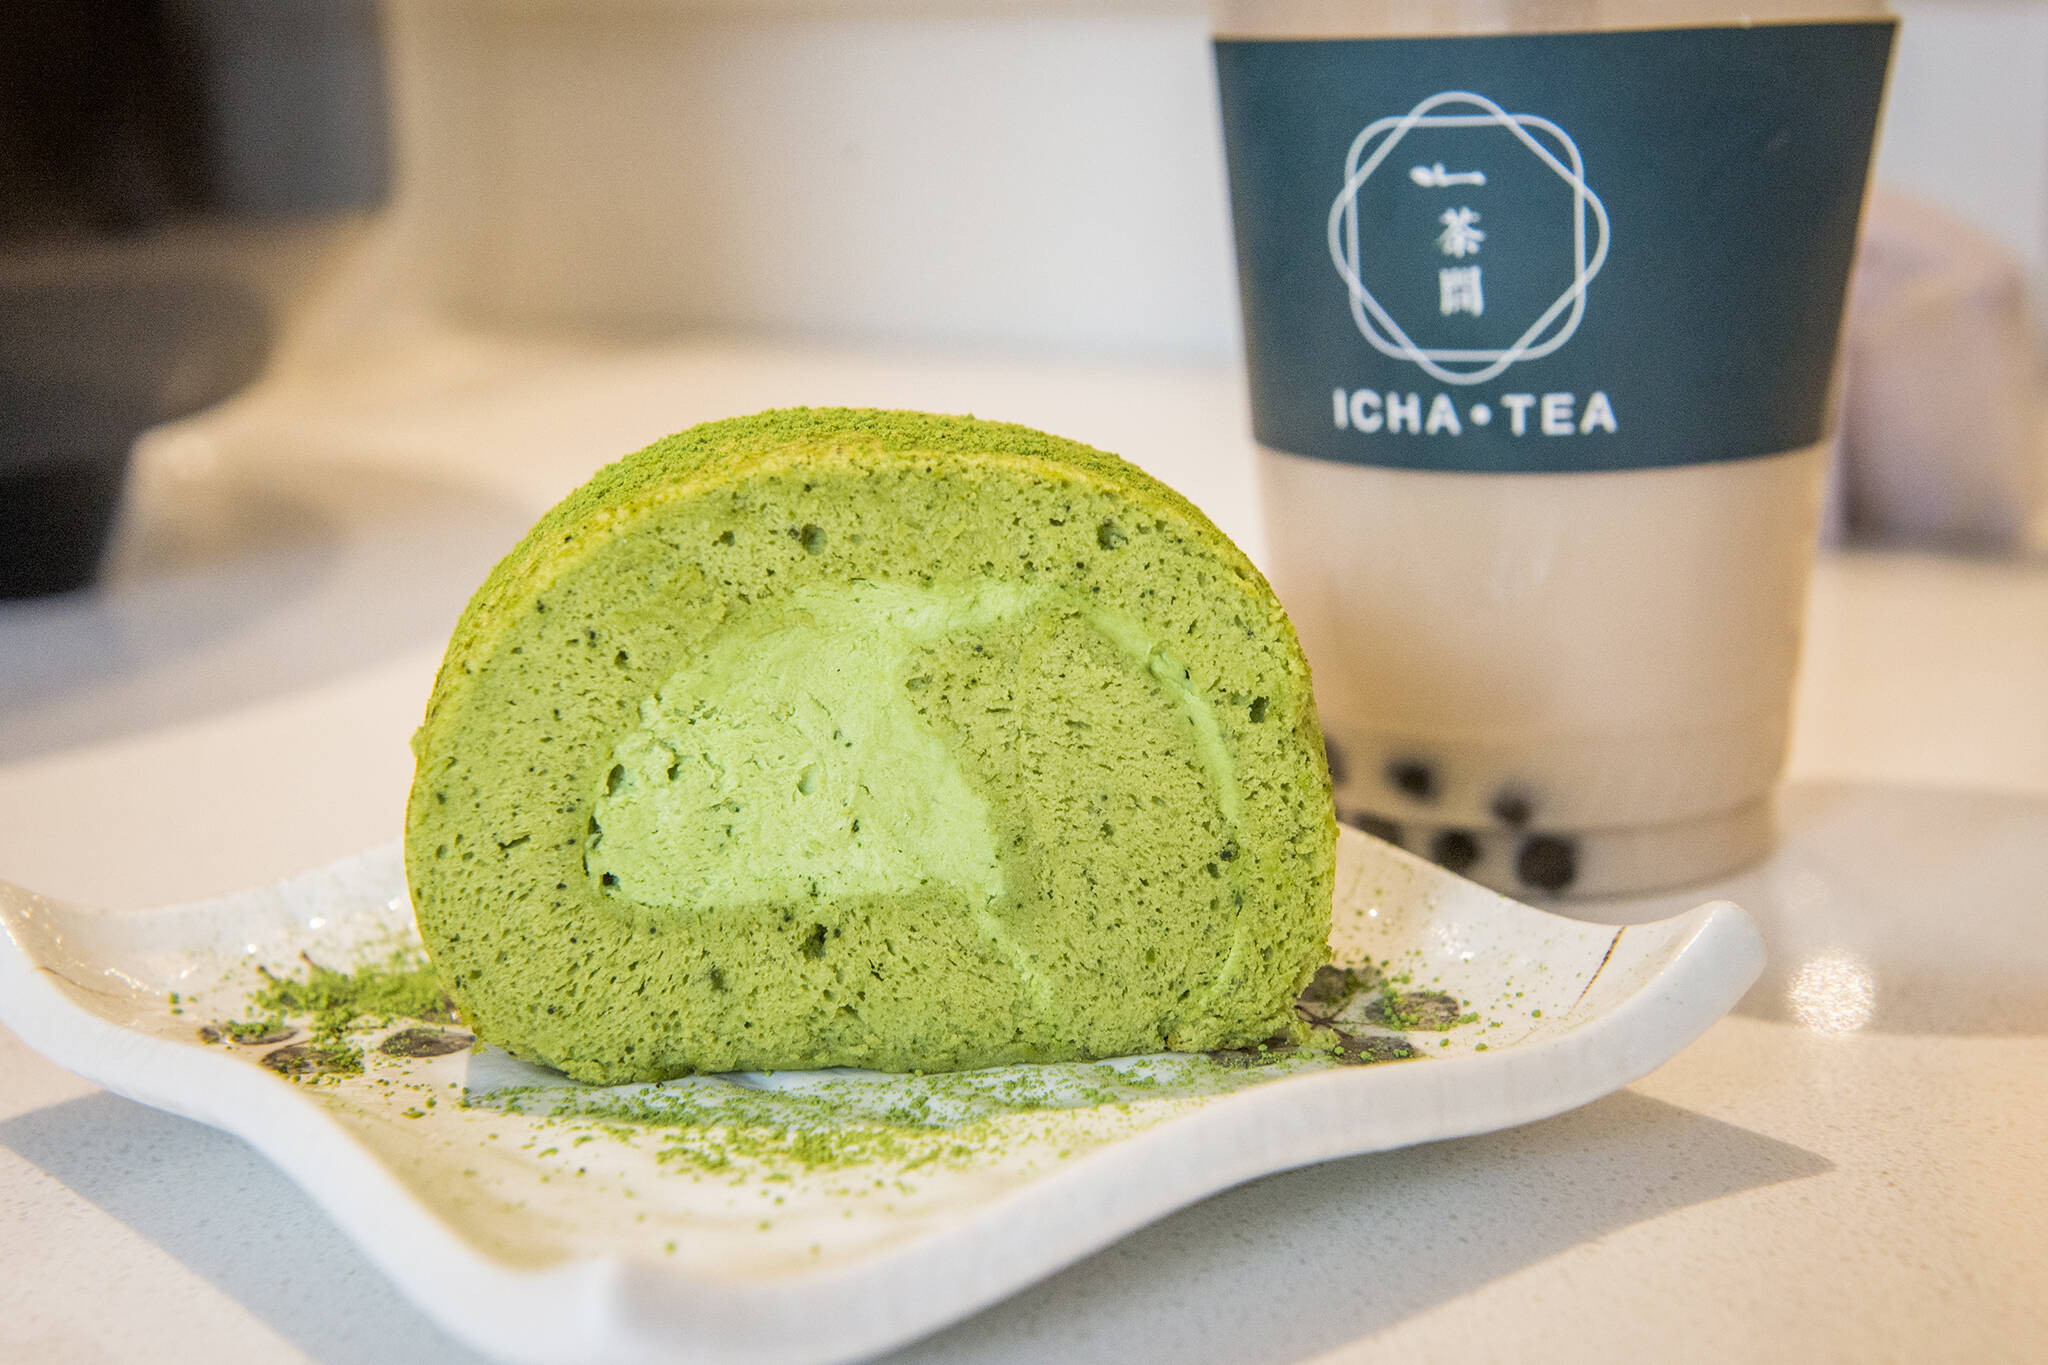 Icha Tea Toronto